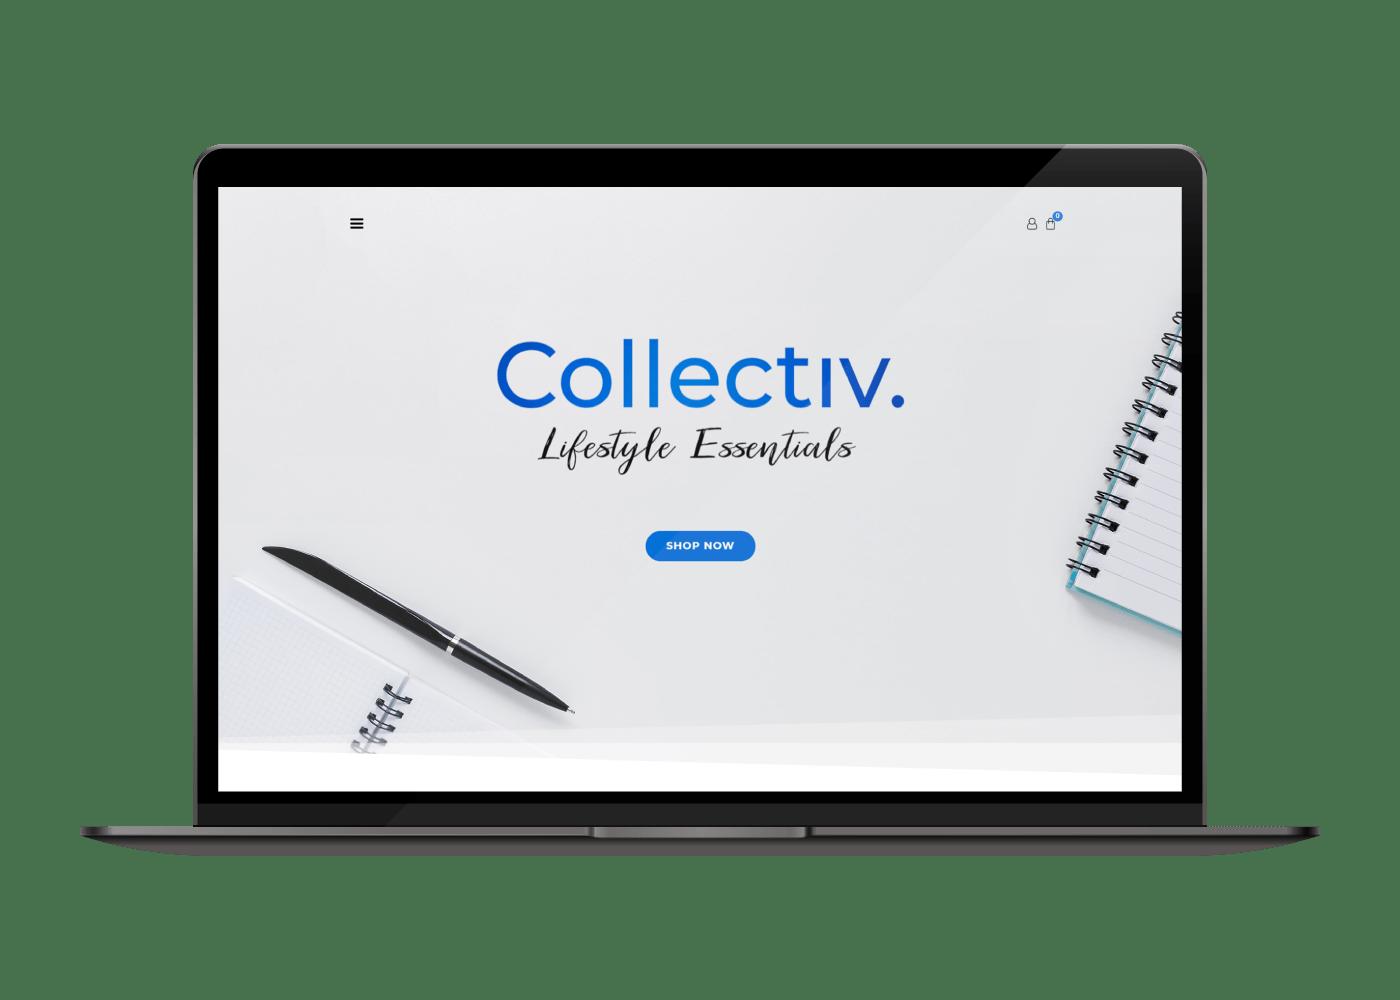 Collectiv. desktop website